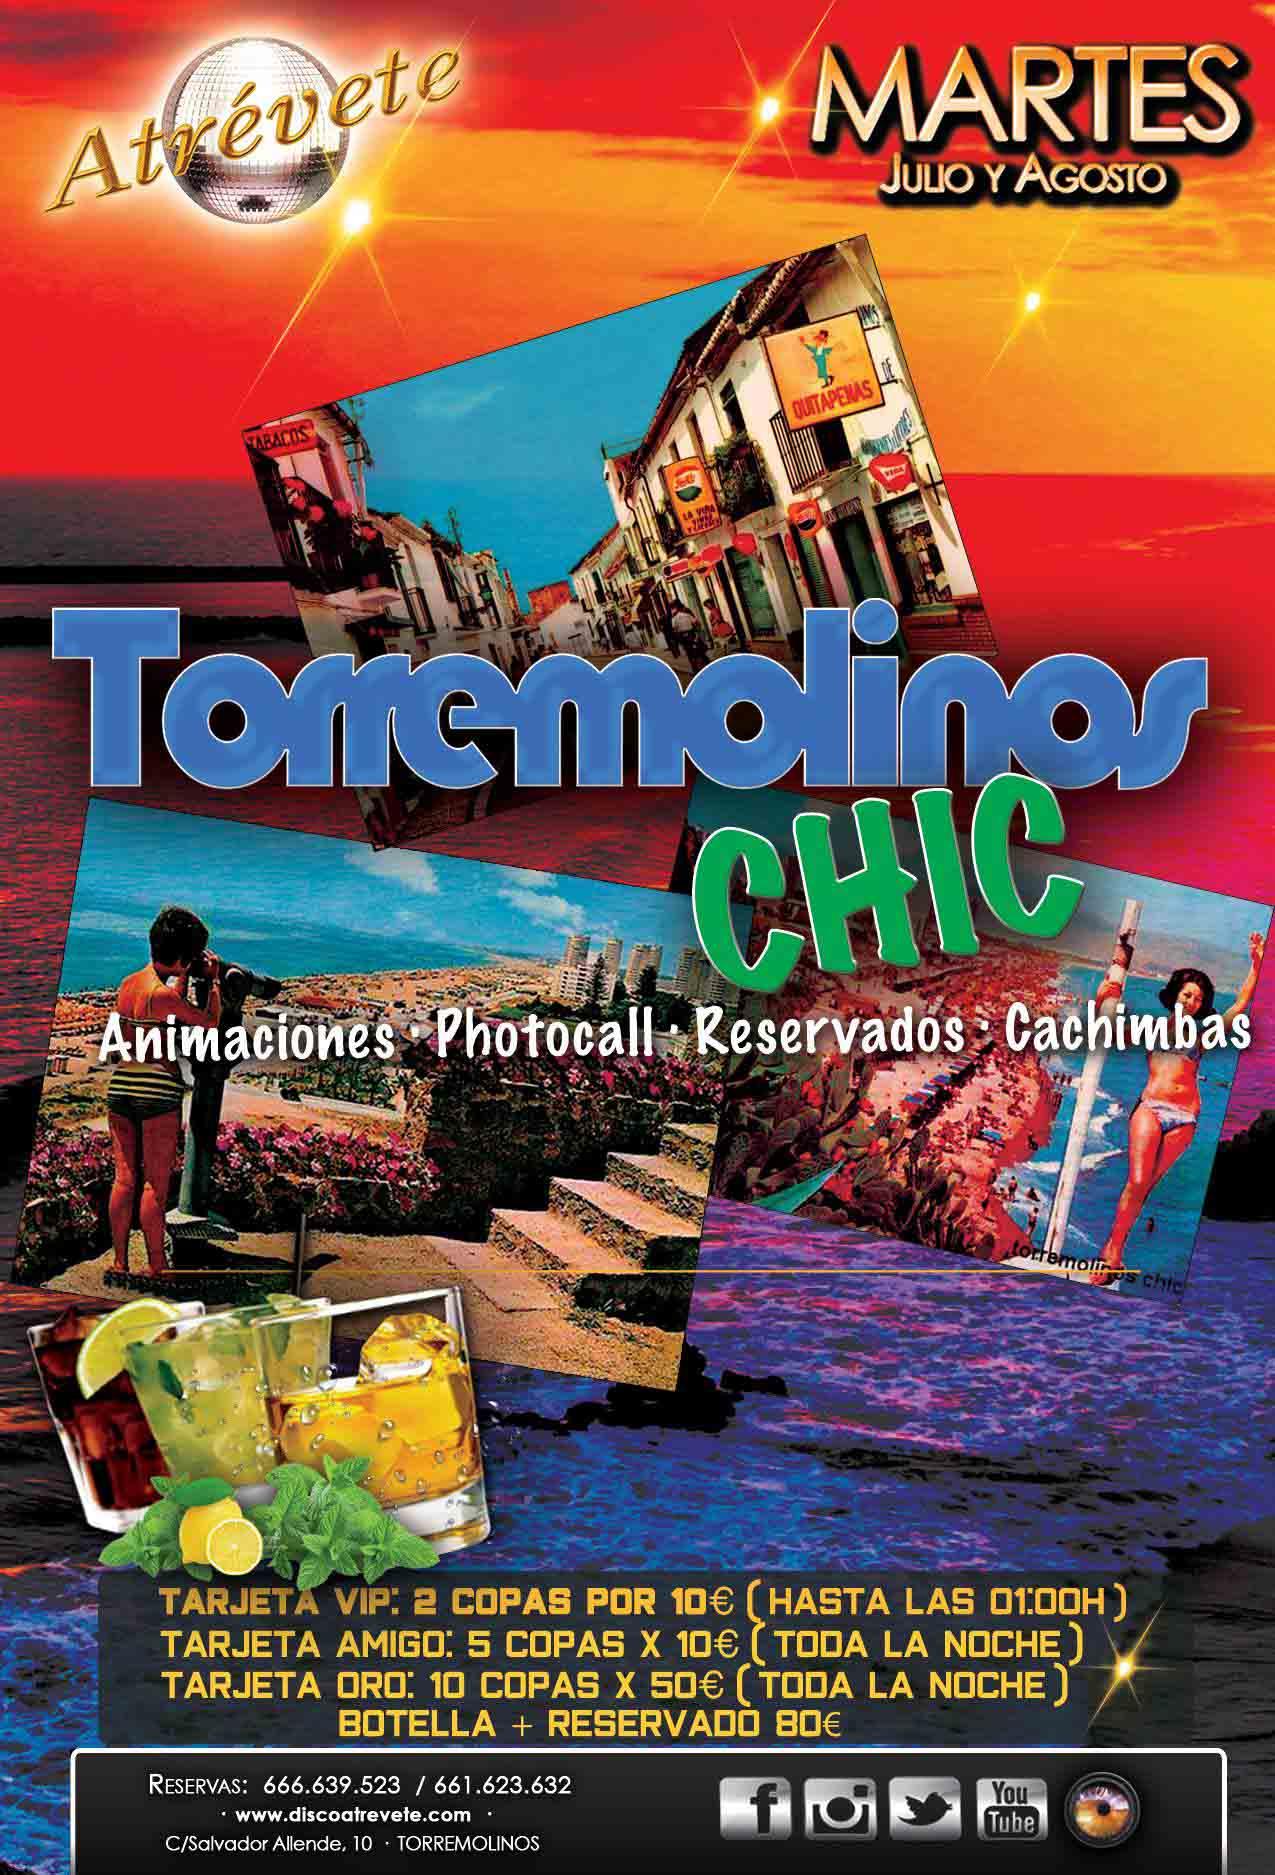 TORREMOLINOS CHIC